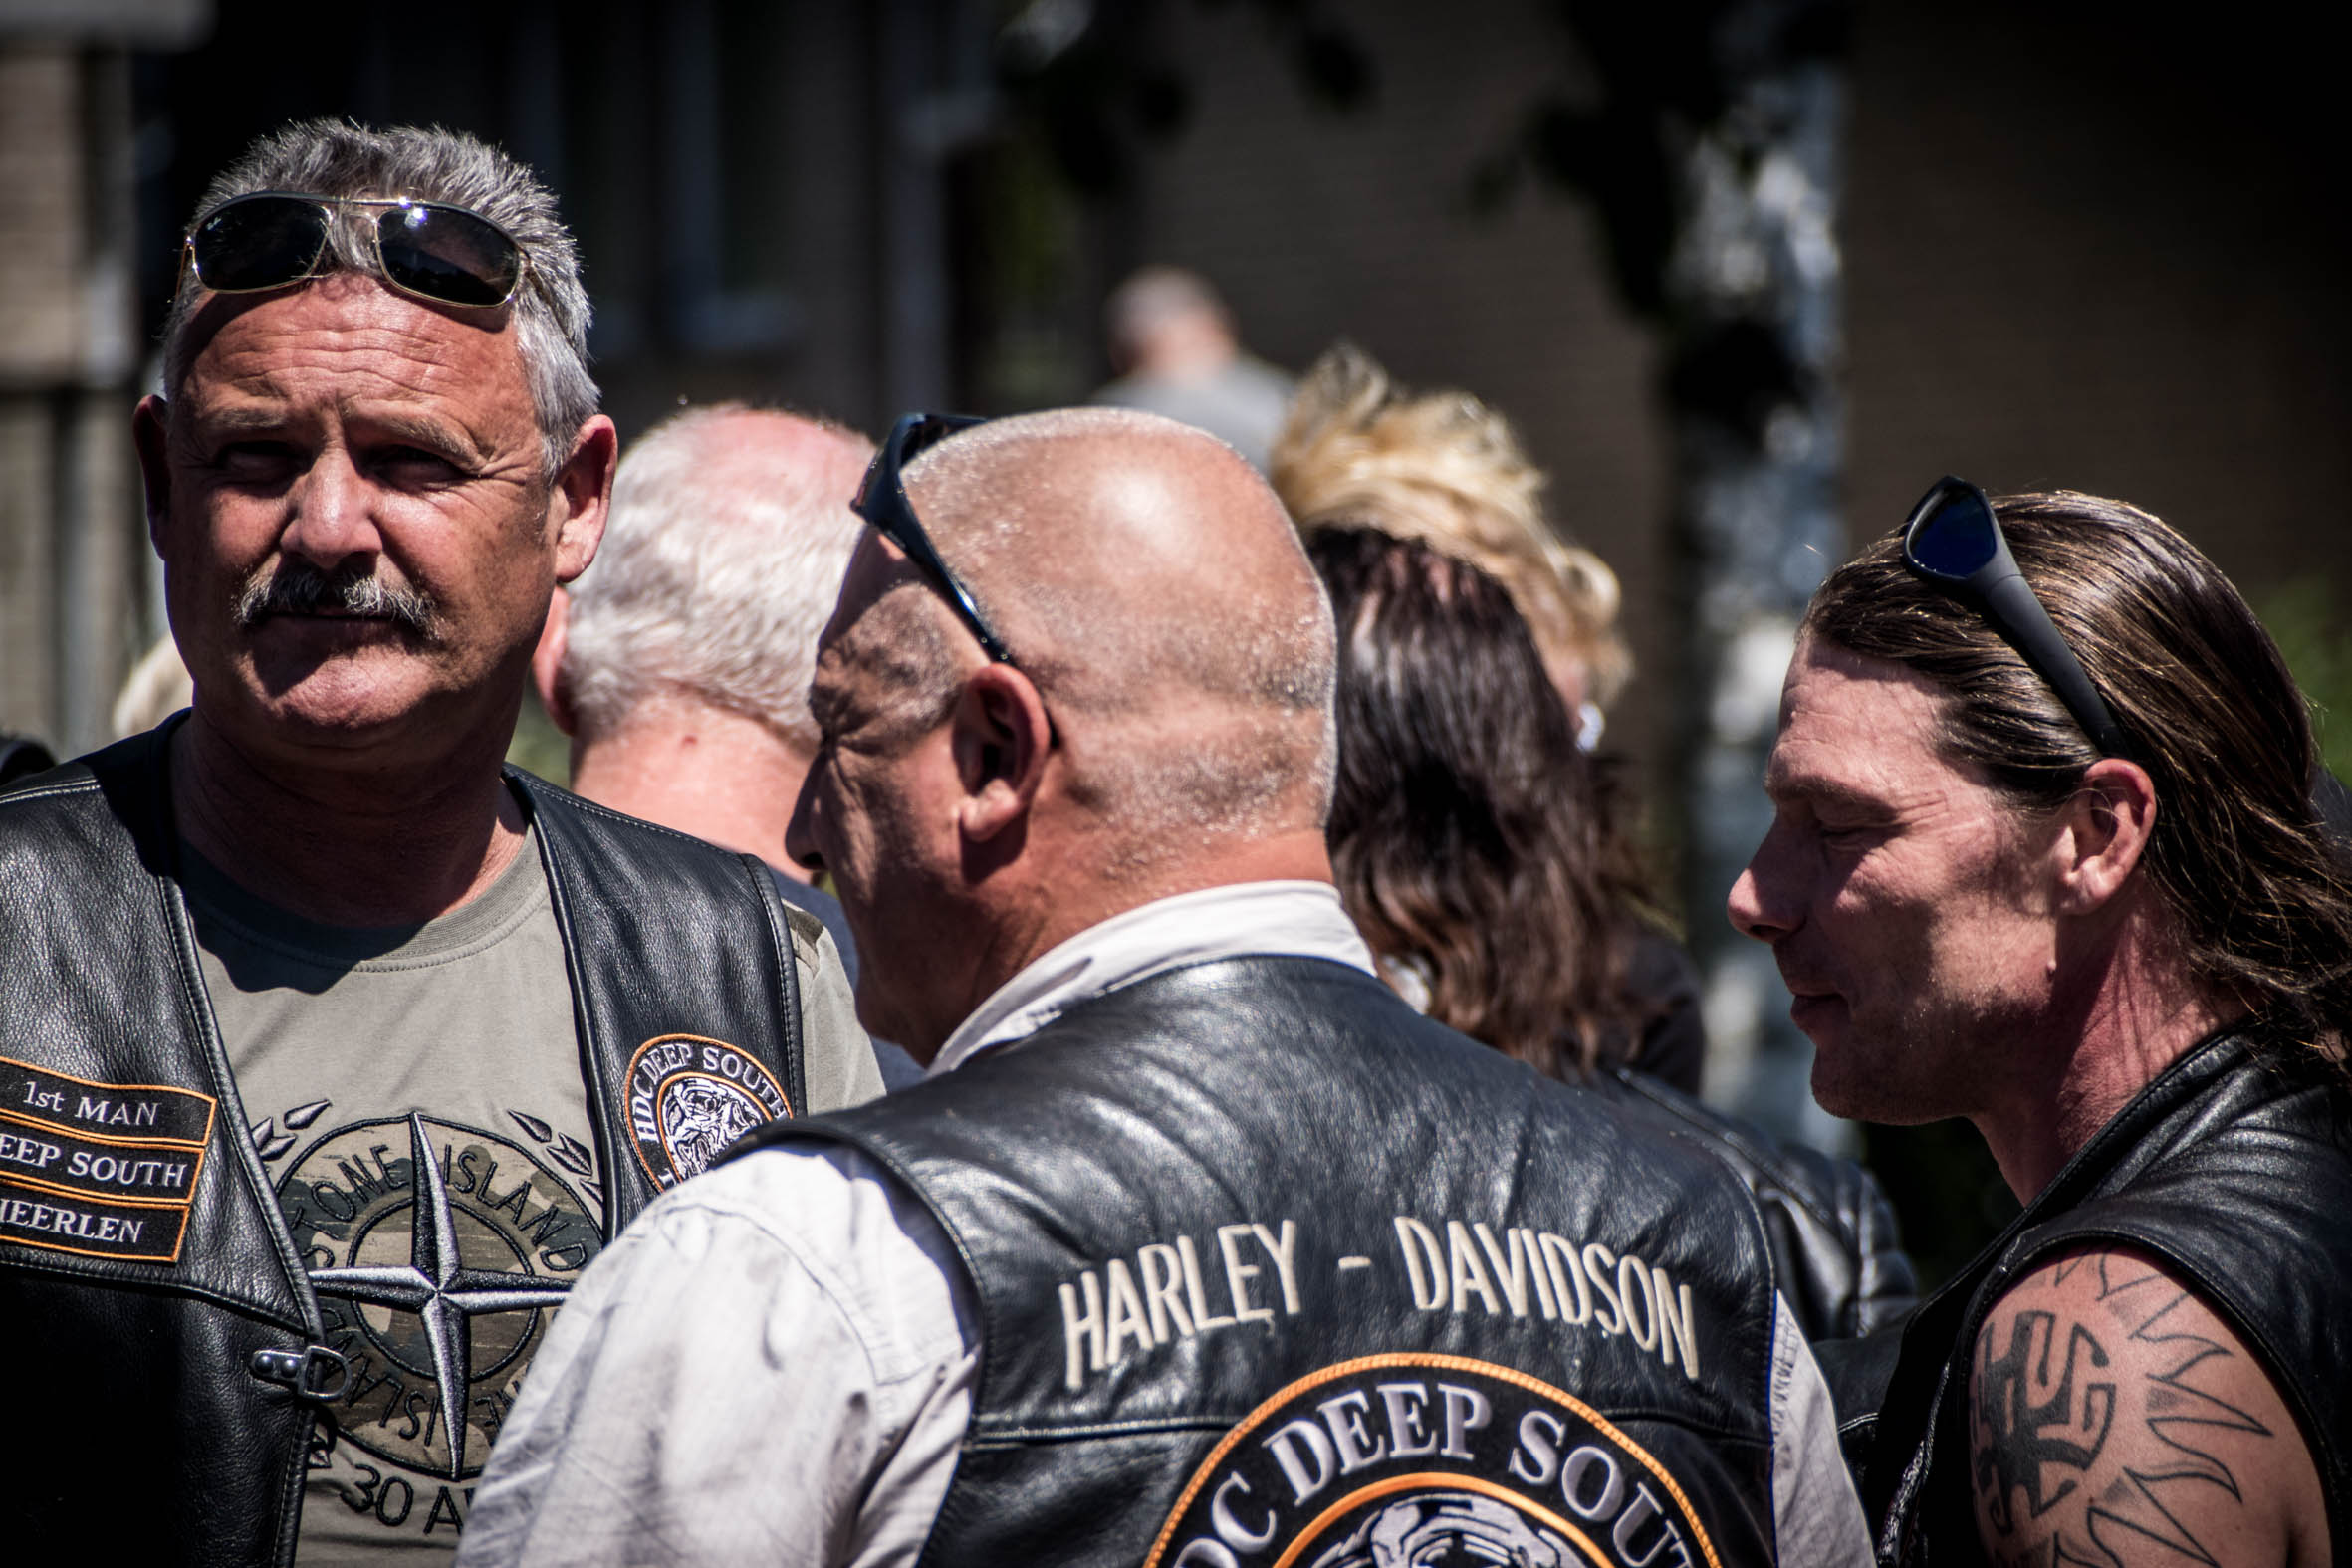 180701 Harley Davidson small-09318